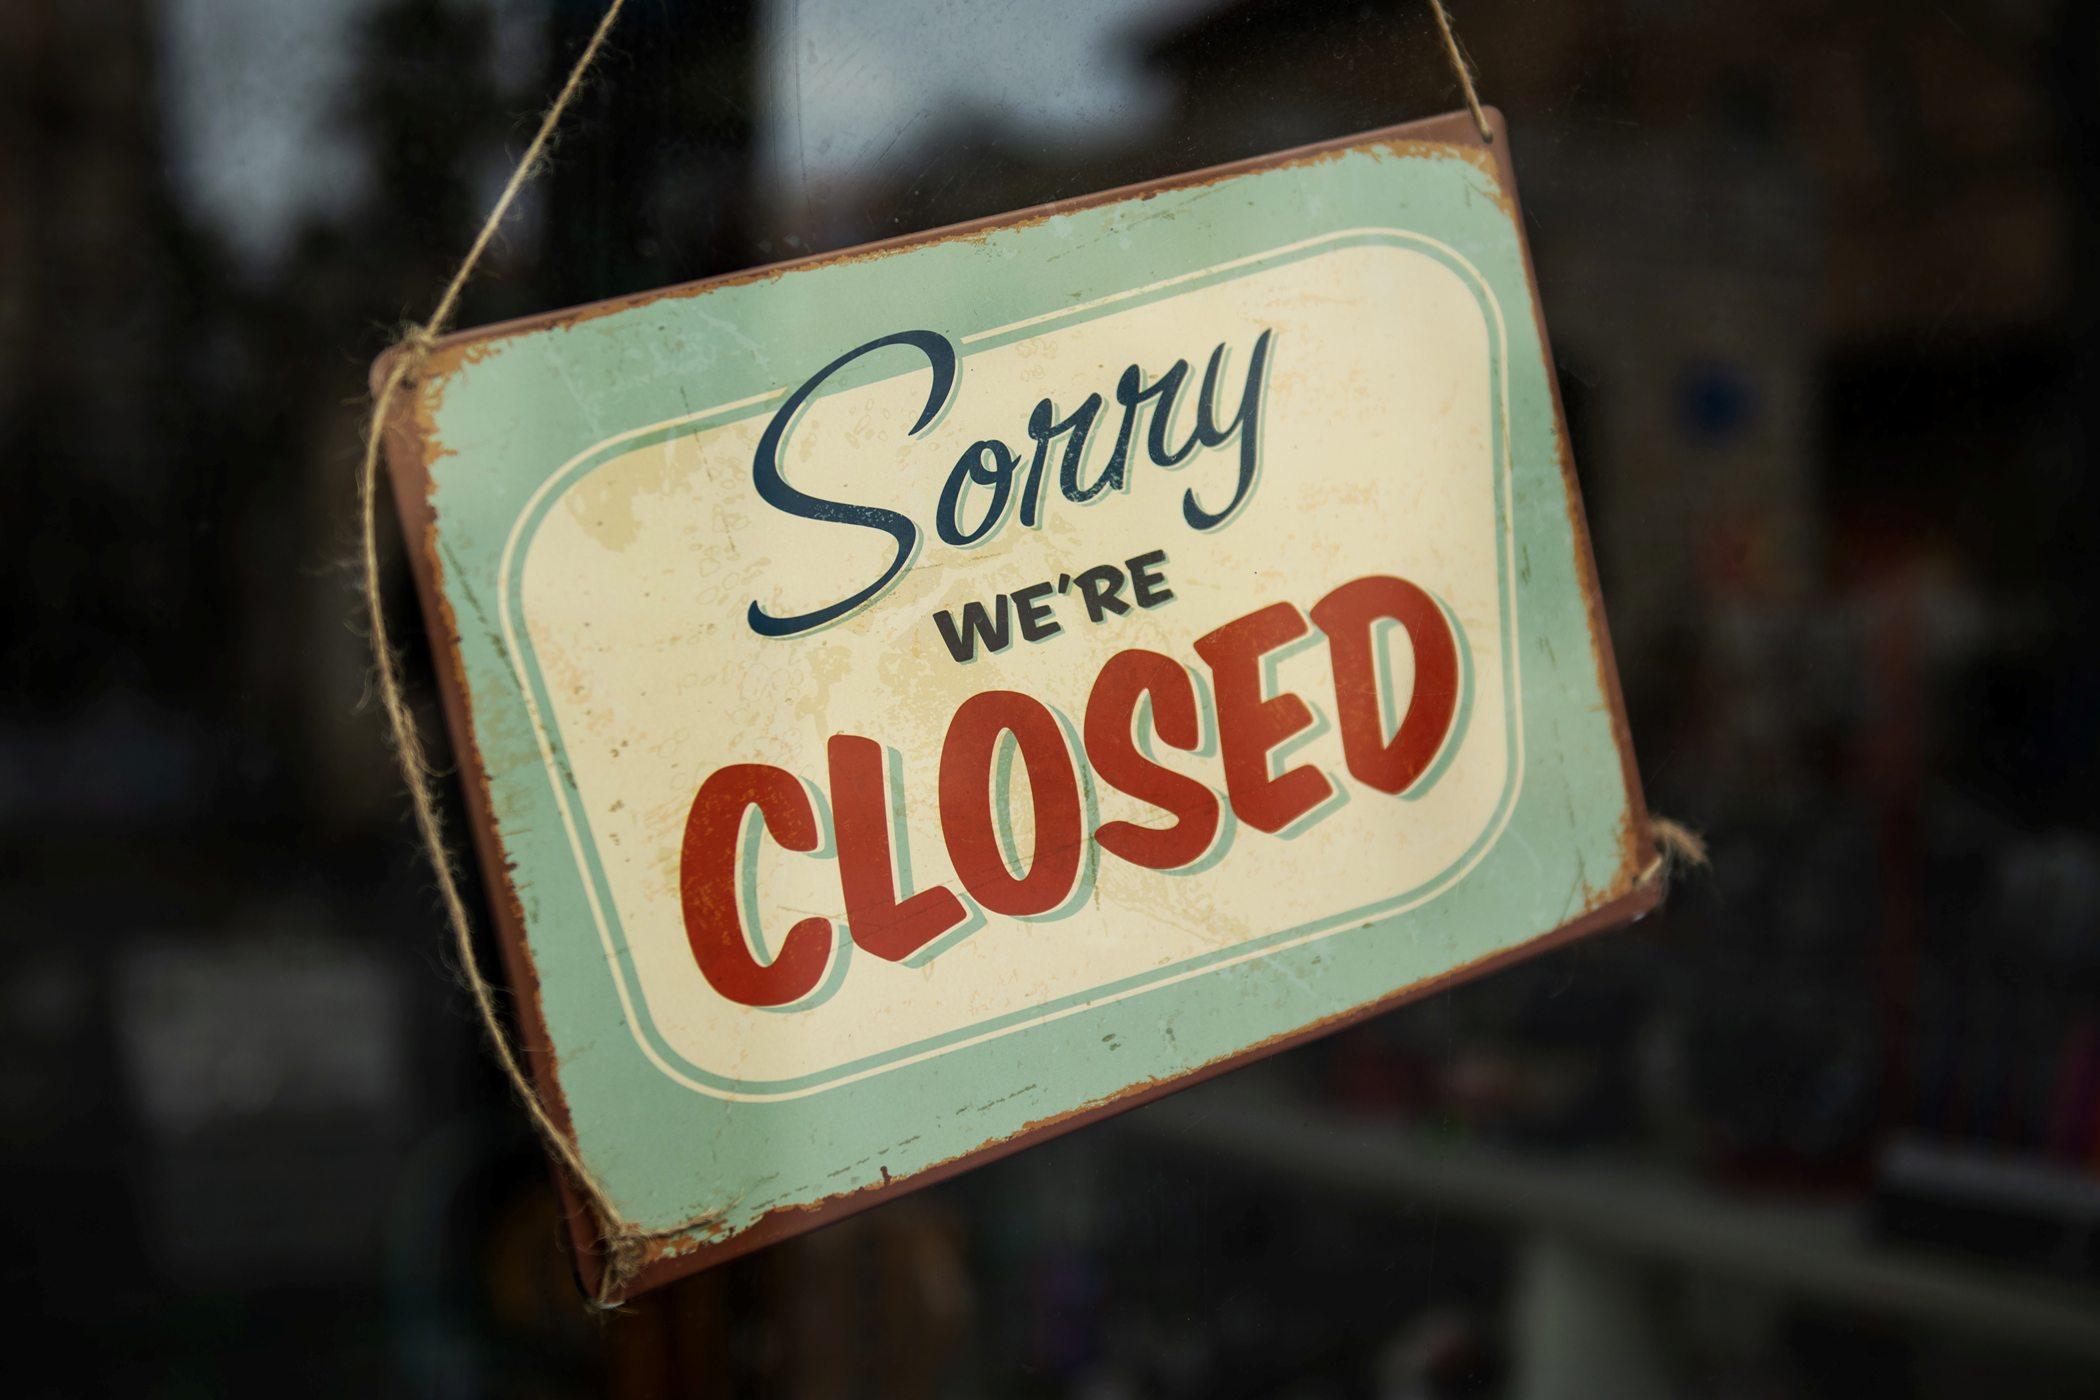 Closed for Arizona Auction